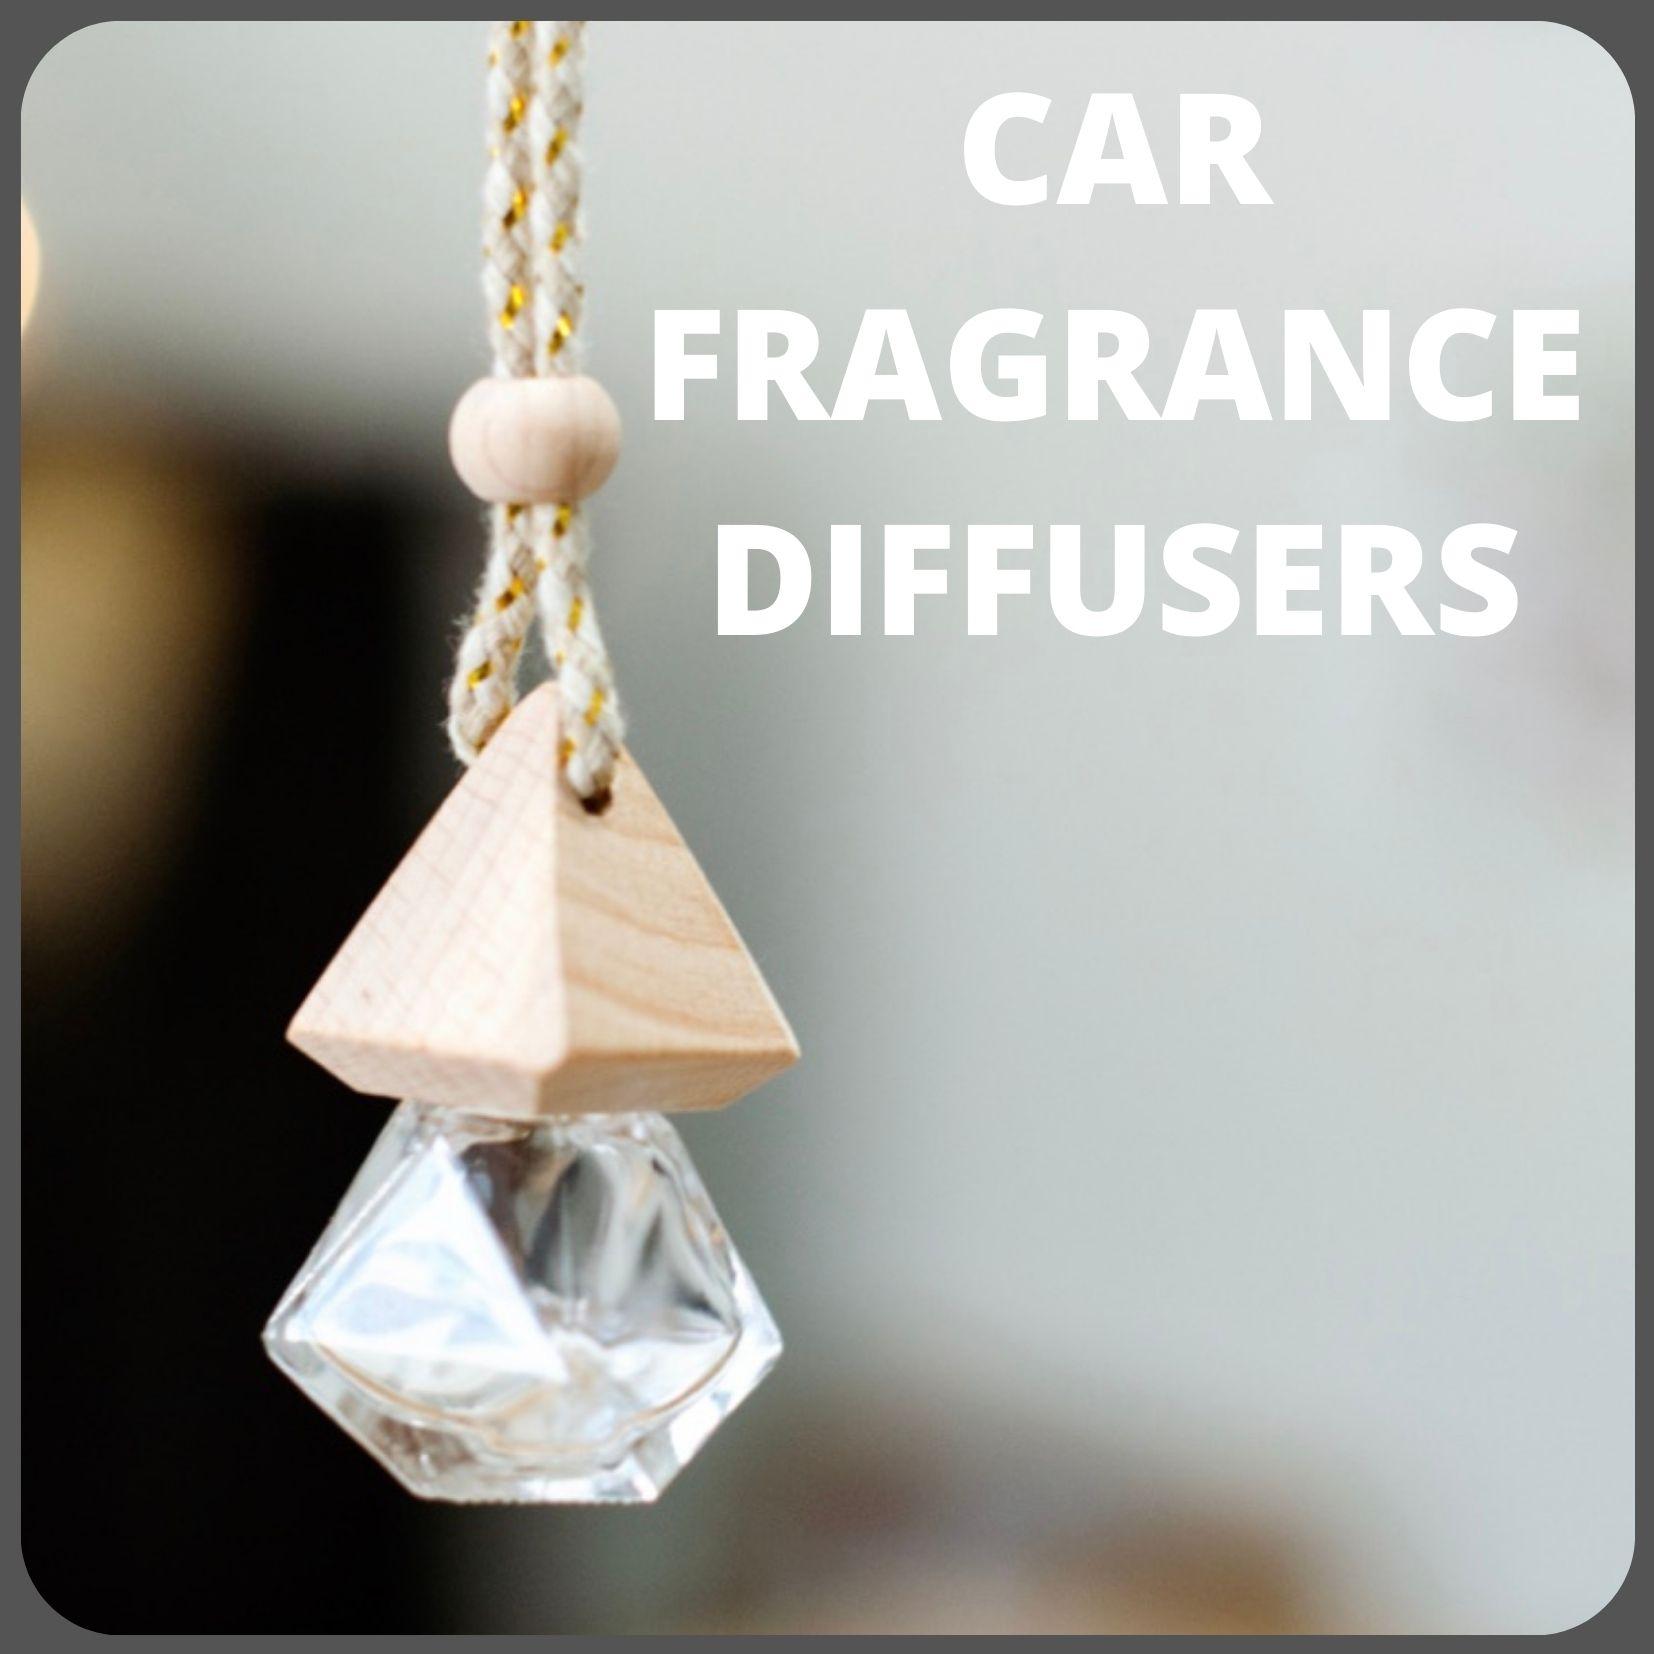 car fragrance diffusers